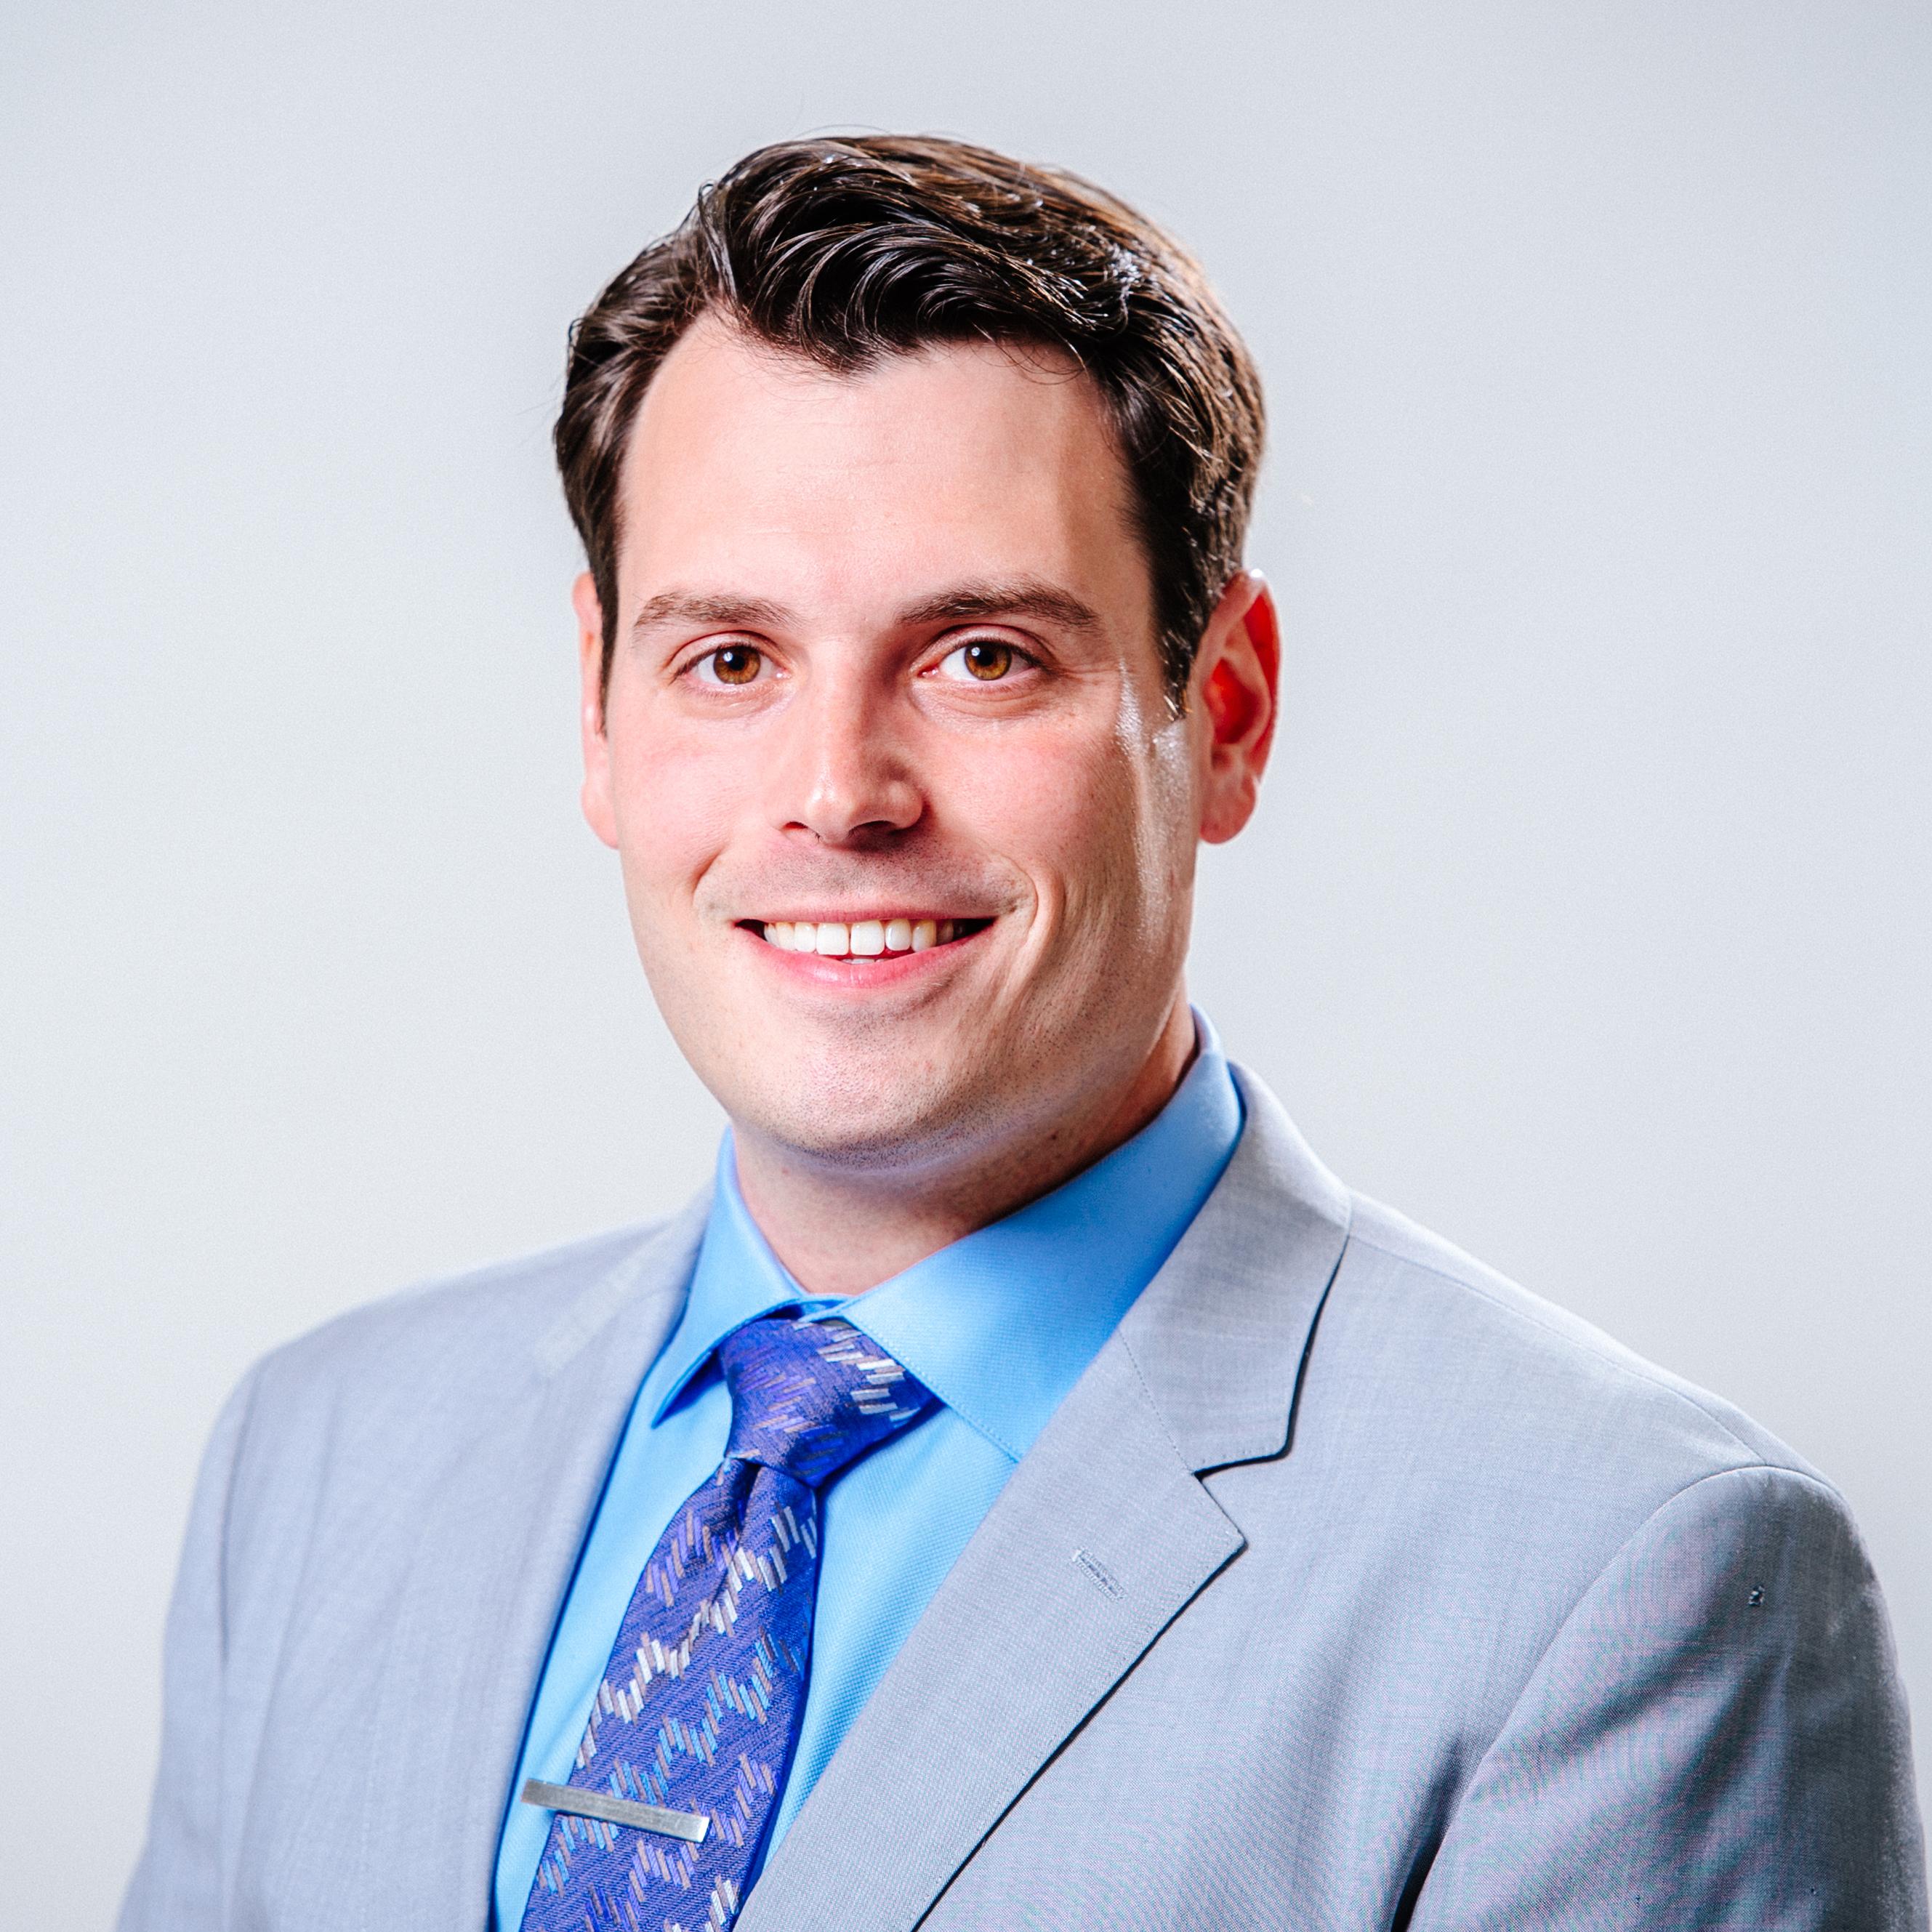 Brian M. Sandroff, PhD